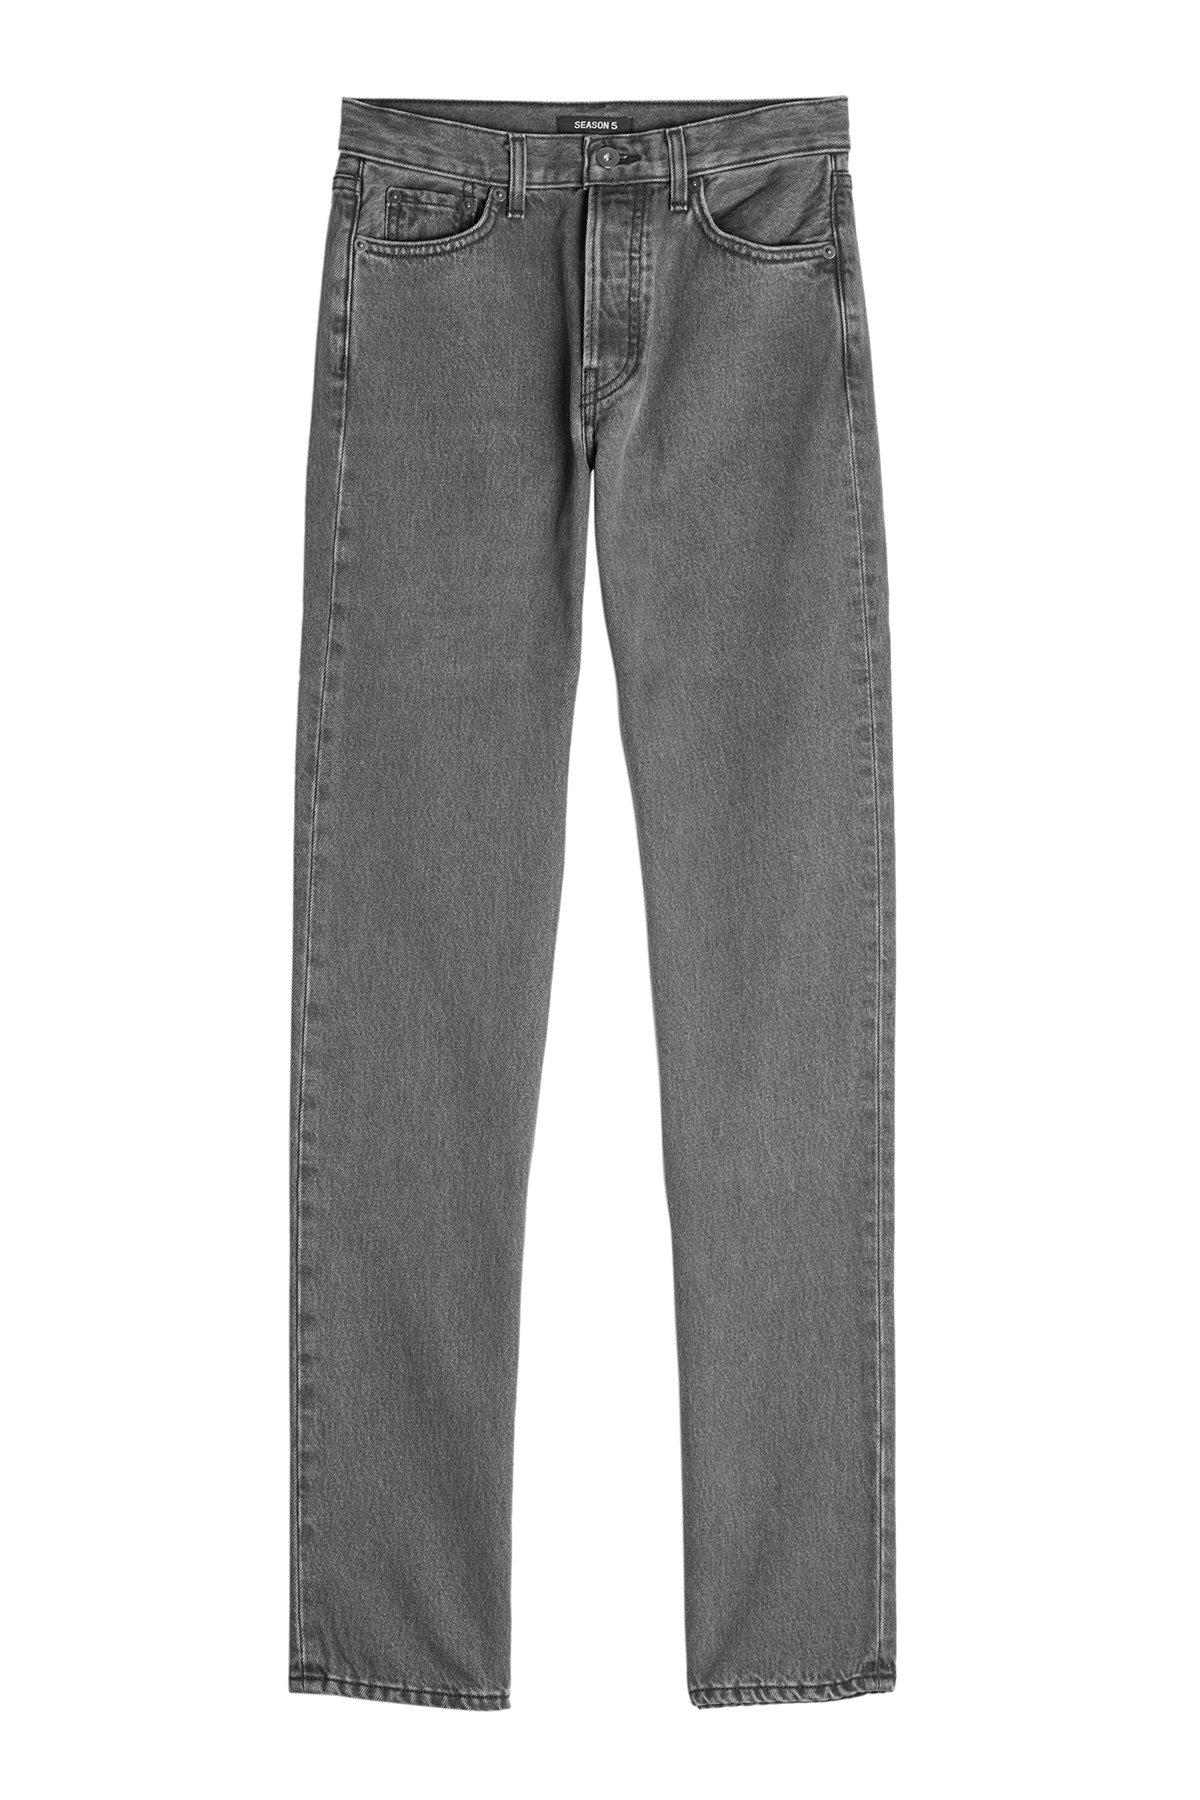 Straight Leg Jeans - Yeezy   WOMEN   US STYLEBOP.COM